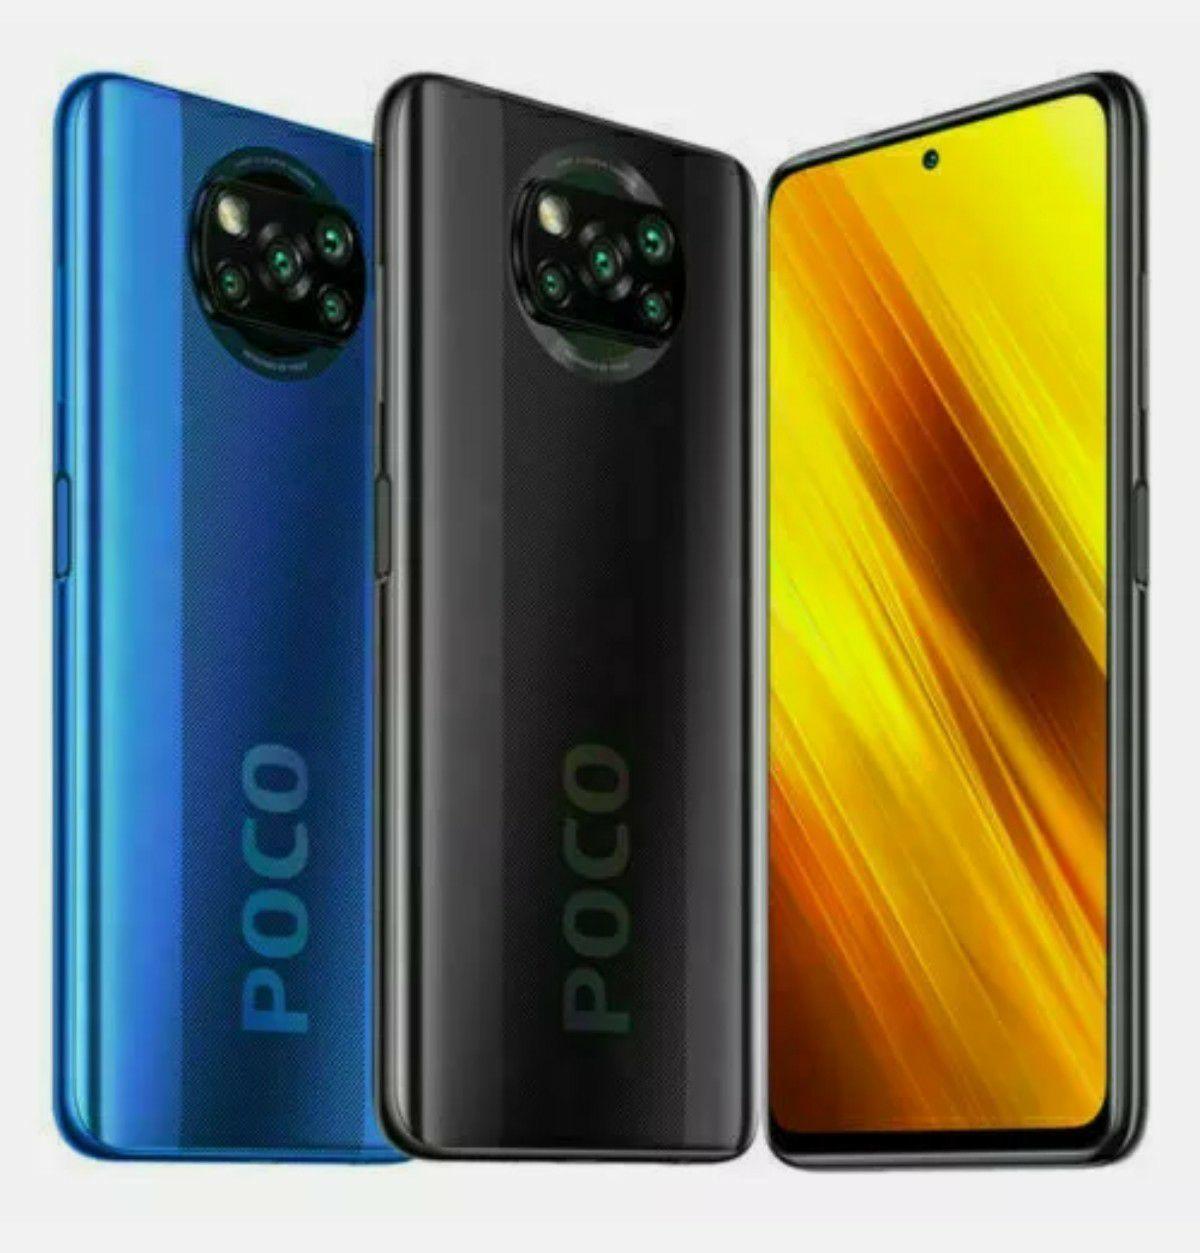 Xiaomi Smartphone POCO X3 6+128G NFC 5160mAh 6,67 Zoll Handy Globale Version + Rucksack